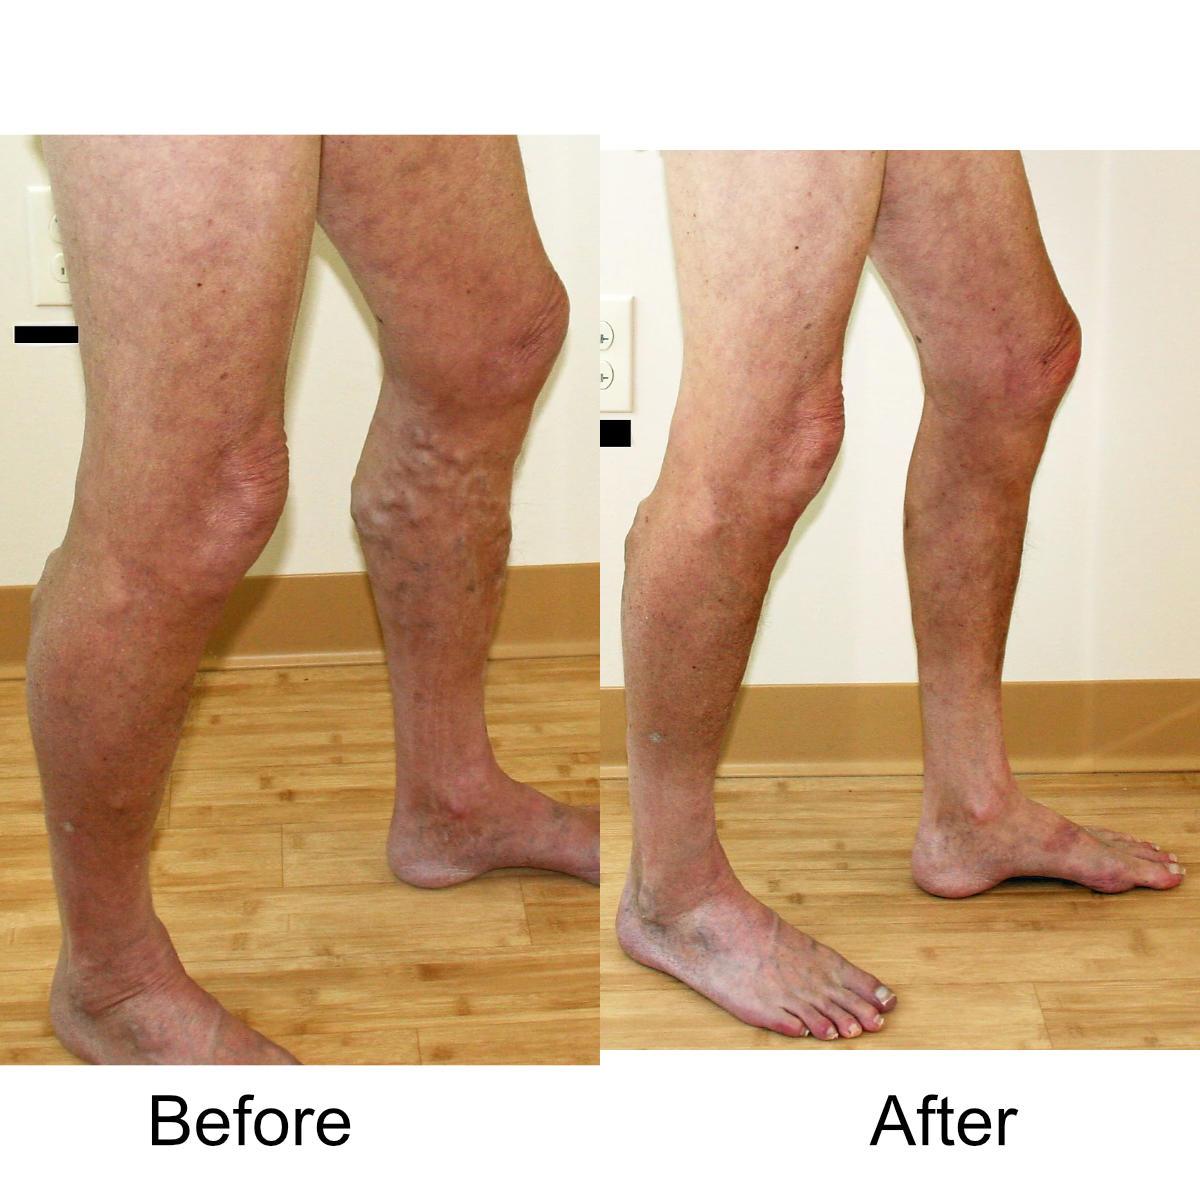 varicose-veins-comparison-12